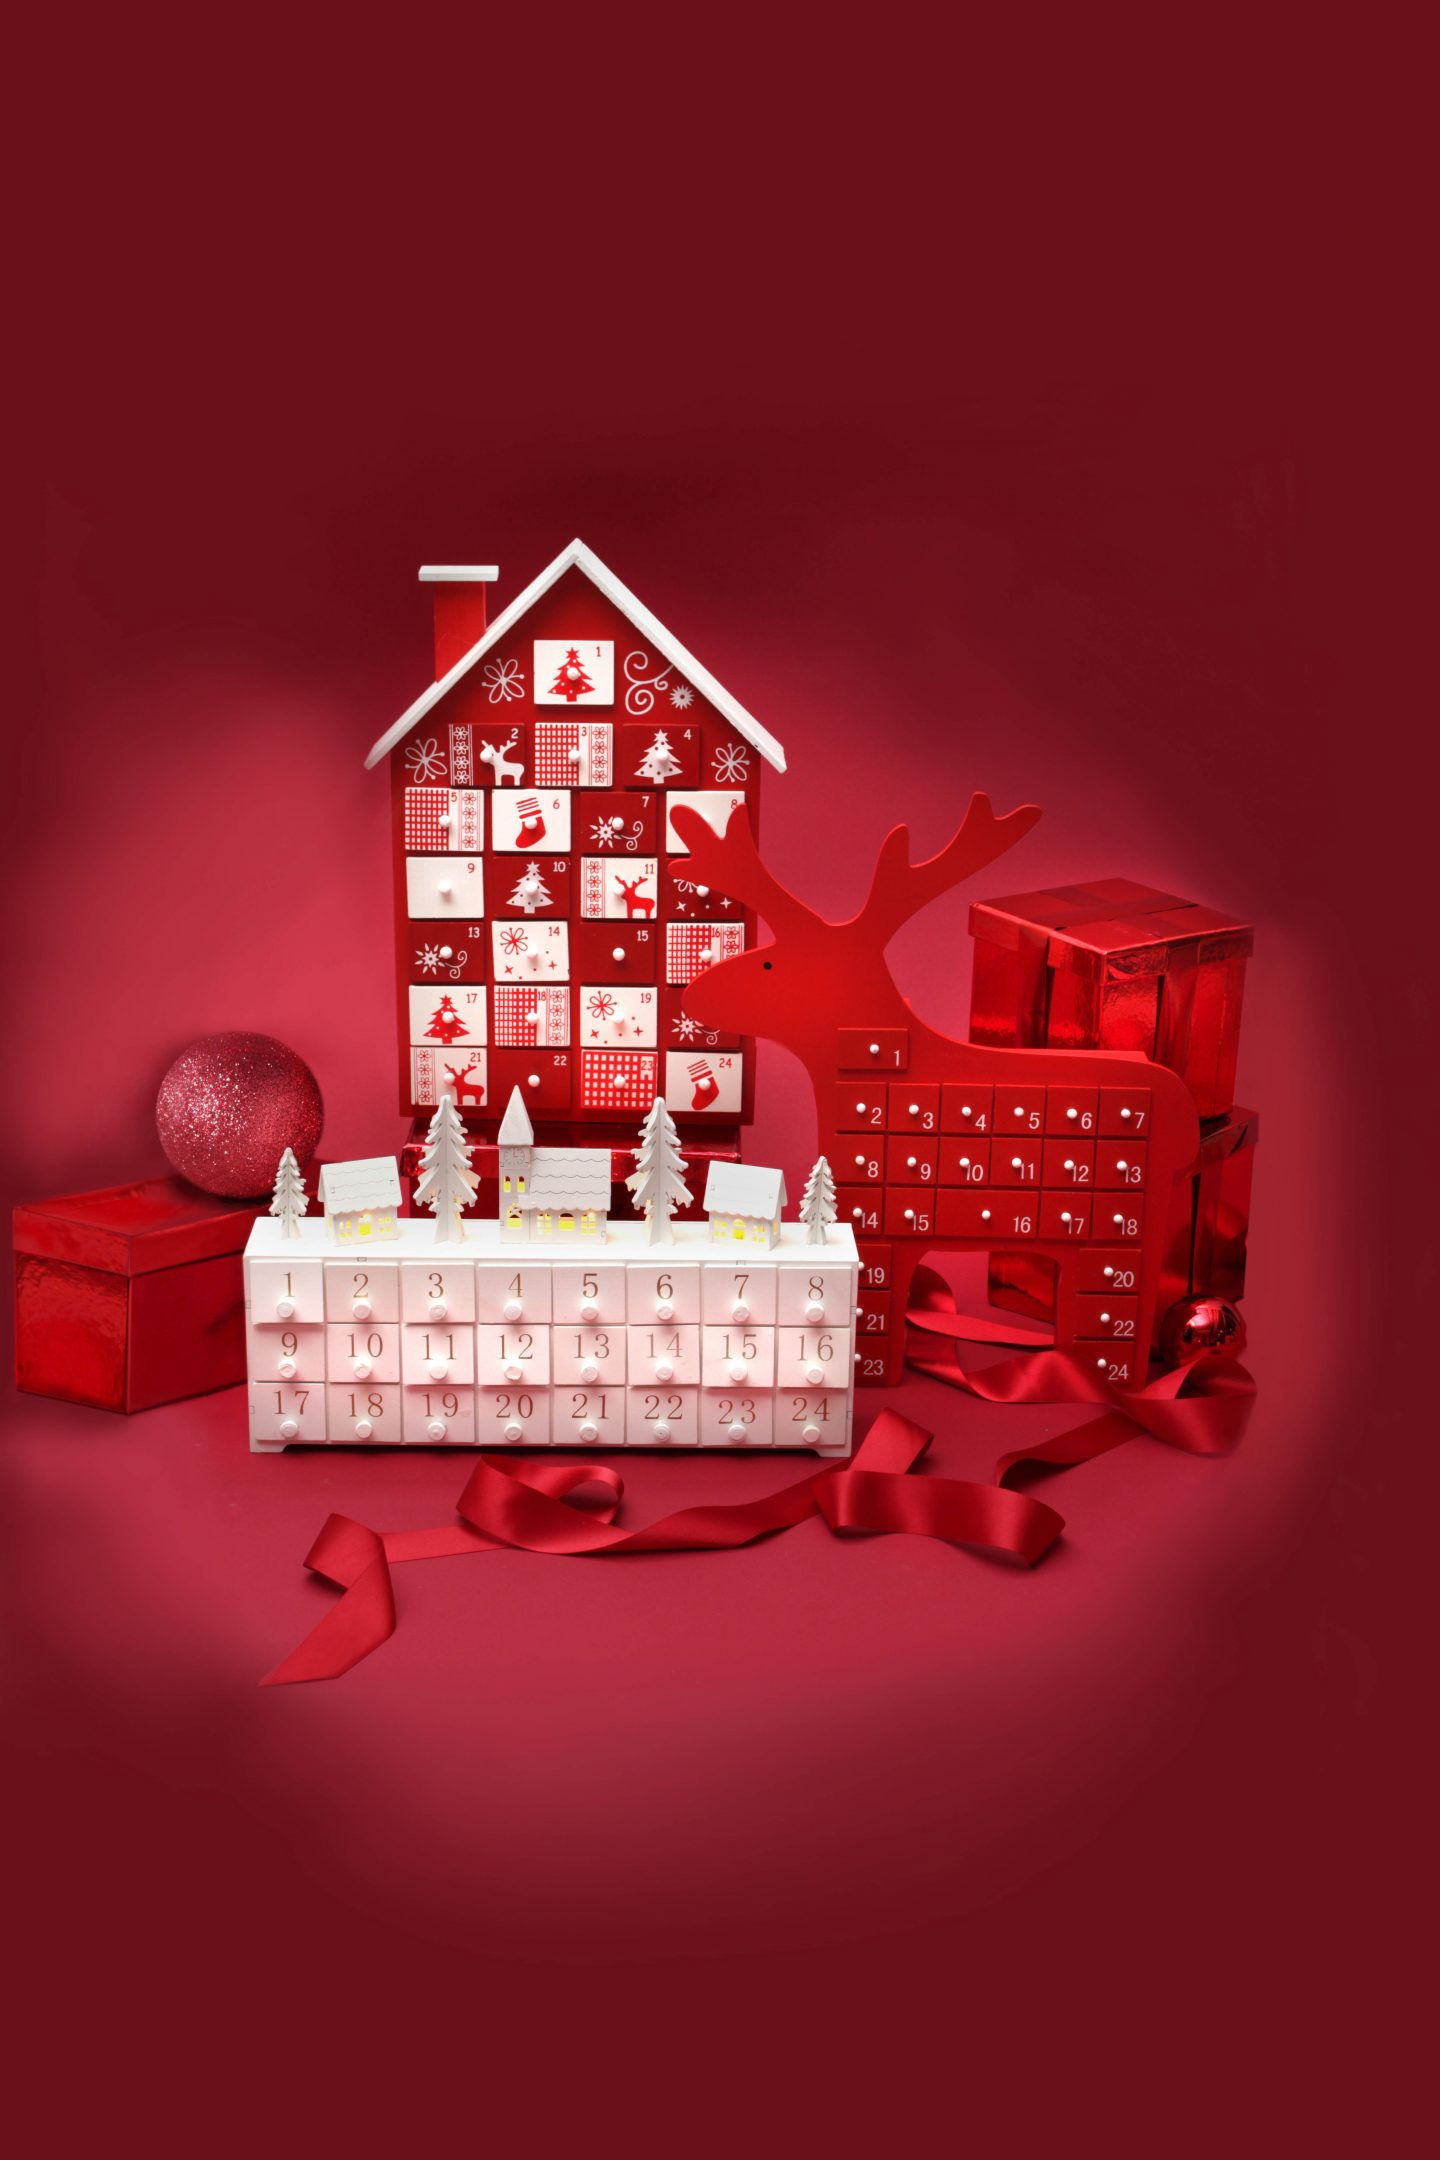 debehnams heaven sends make your own bespoke advent calendar